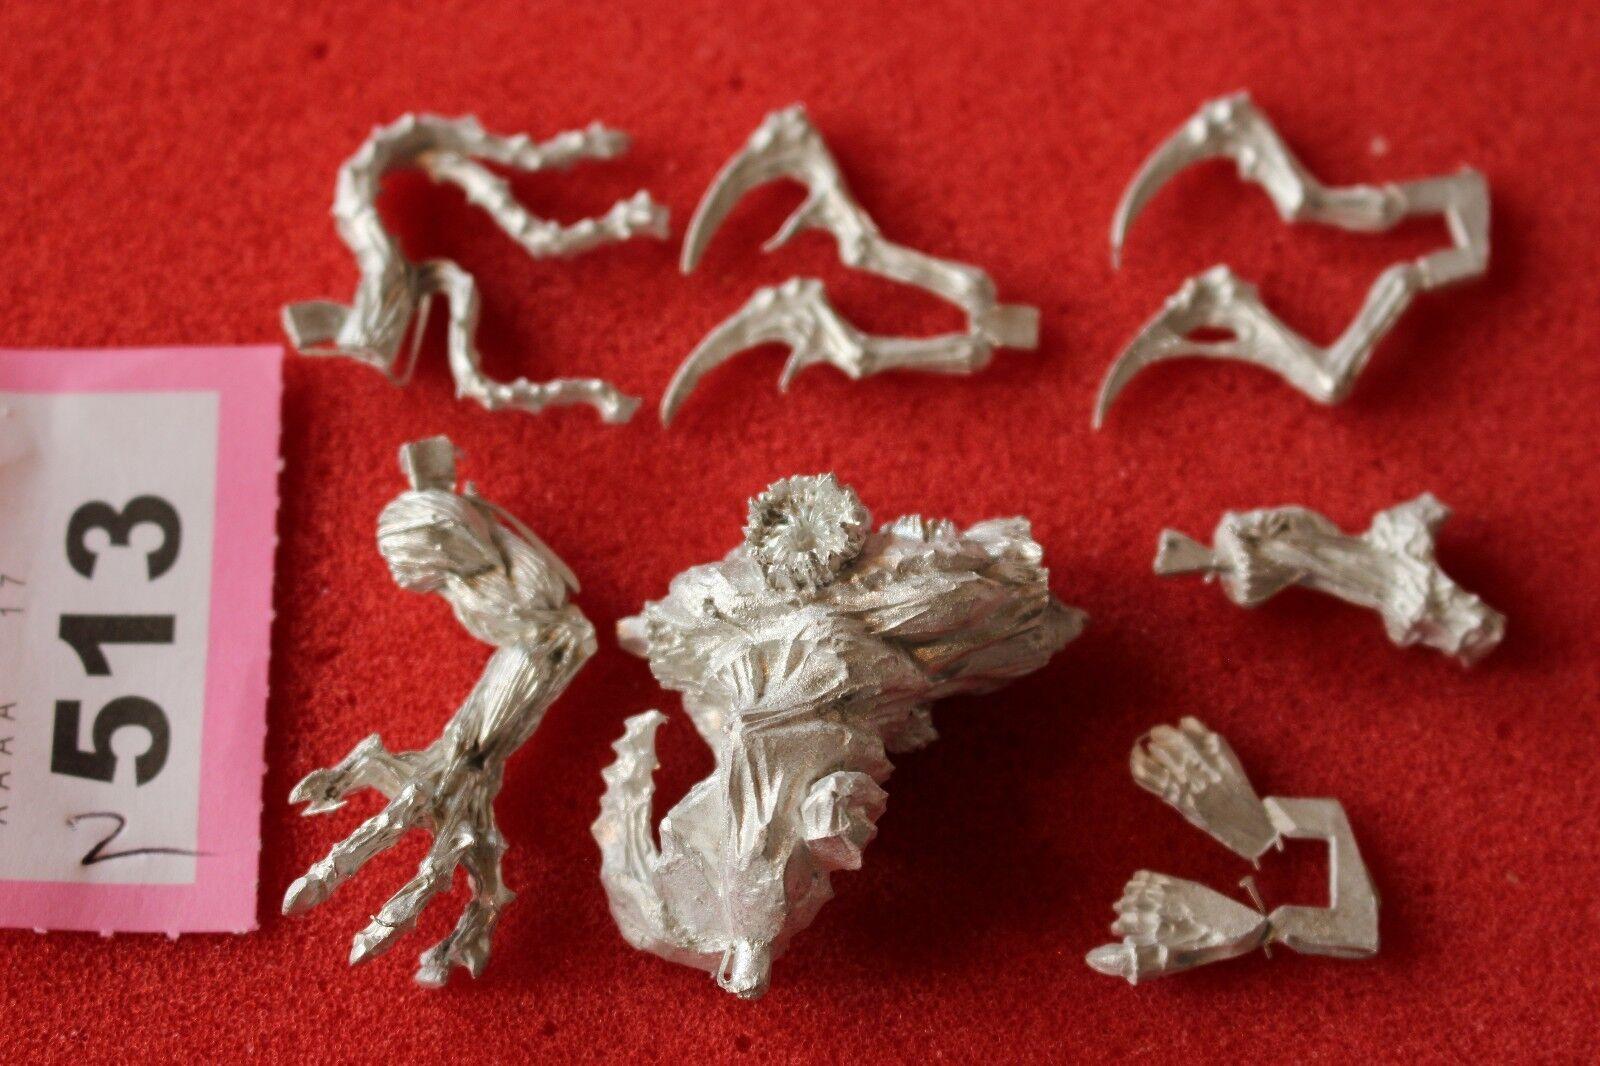 Games Workshop Warhammer Chaos Spawn Metal Fantasy Figure New Mint OOP Complete